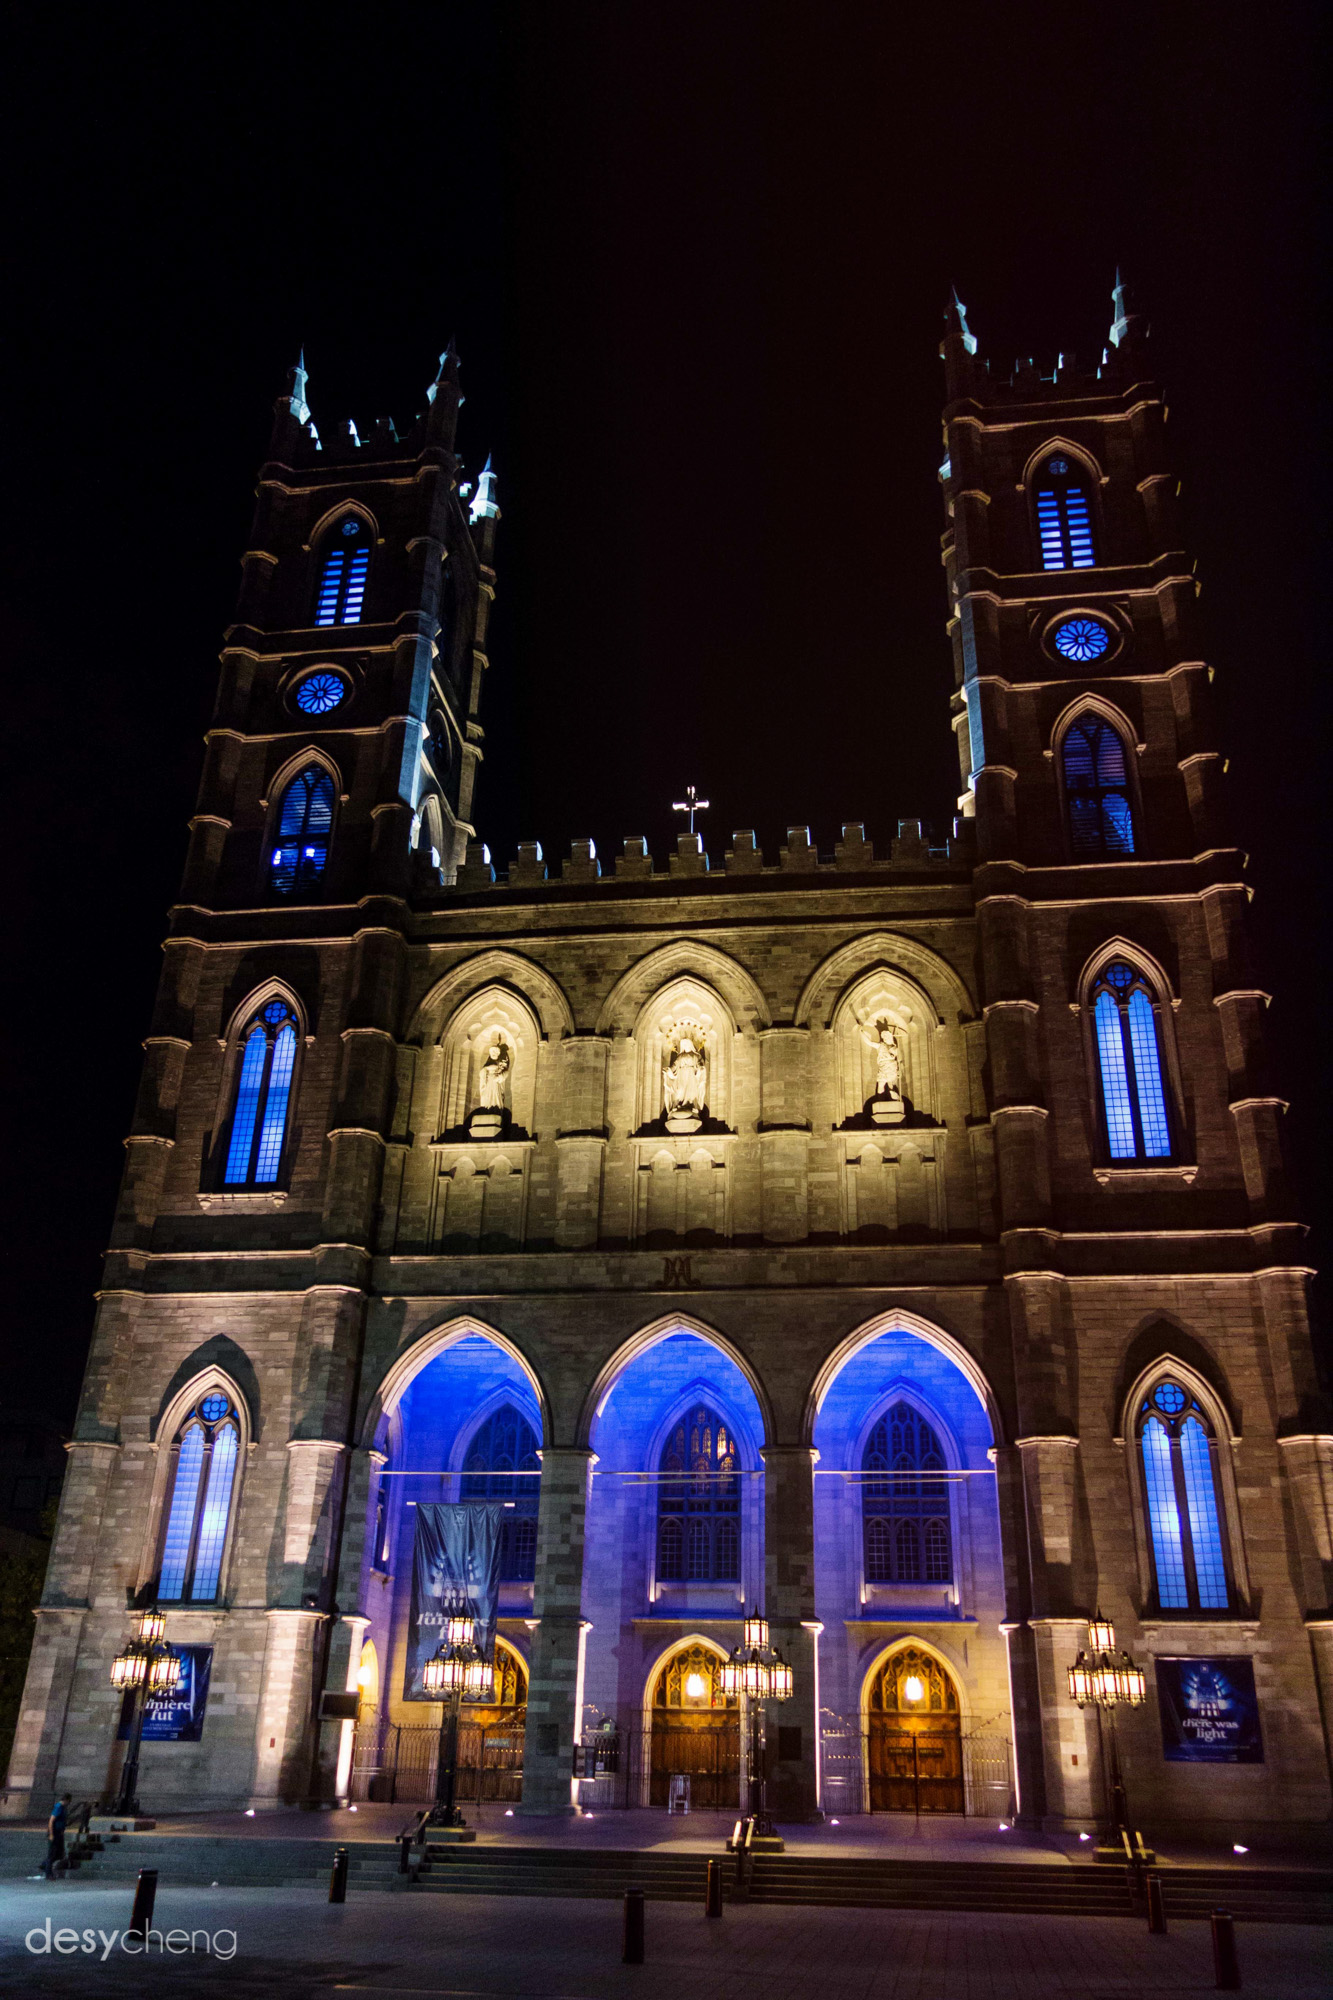 montreal2013-7.jpg